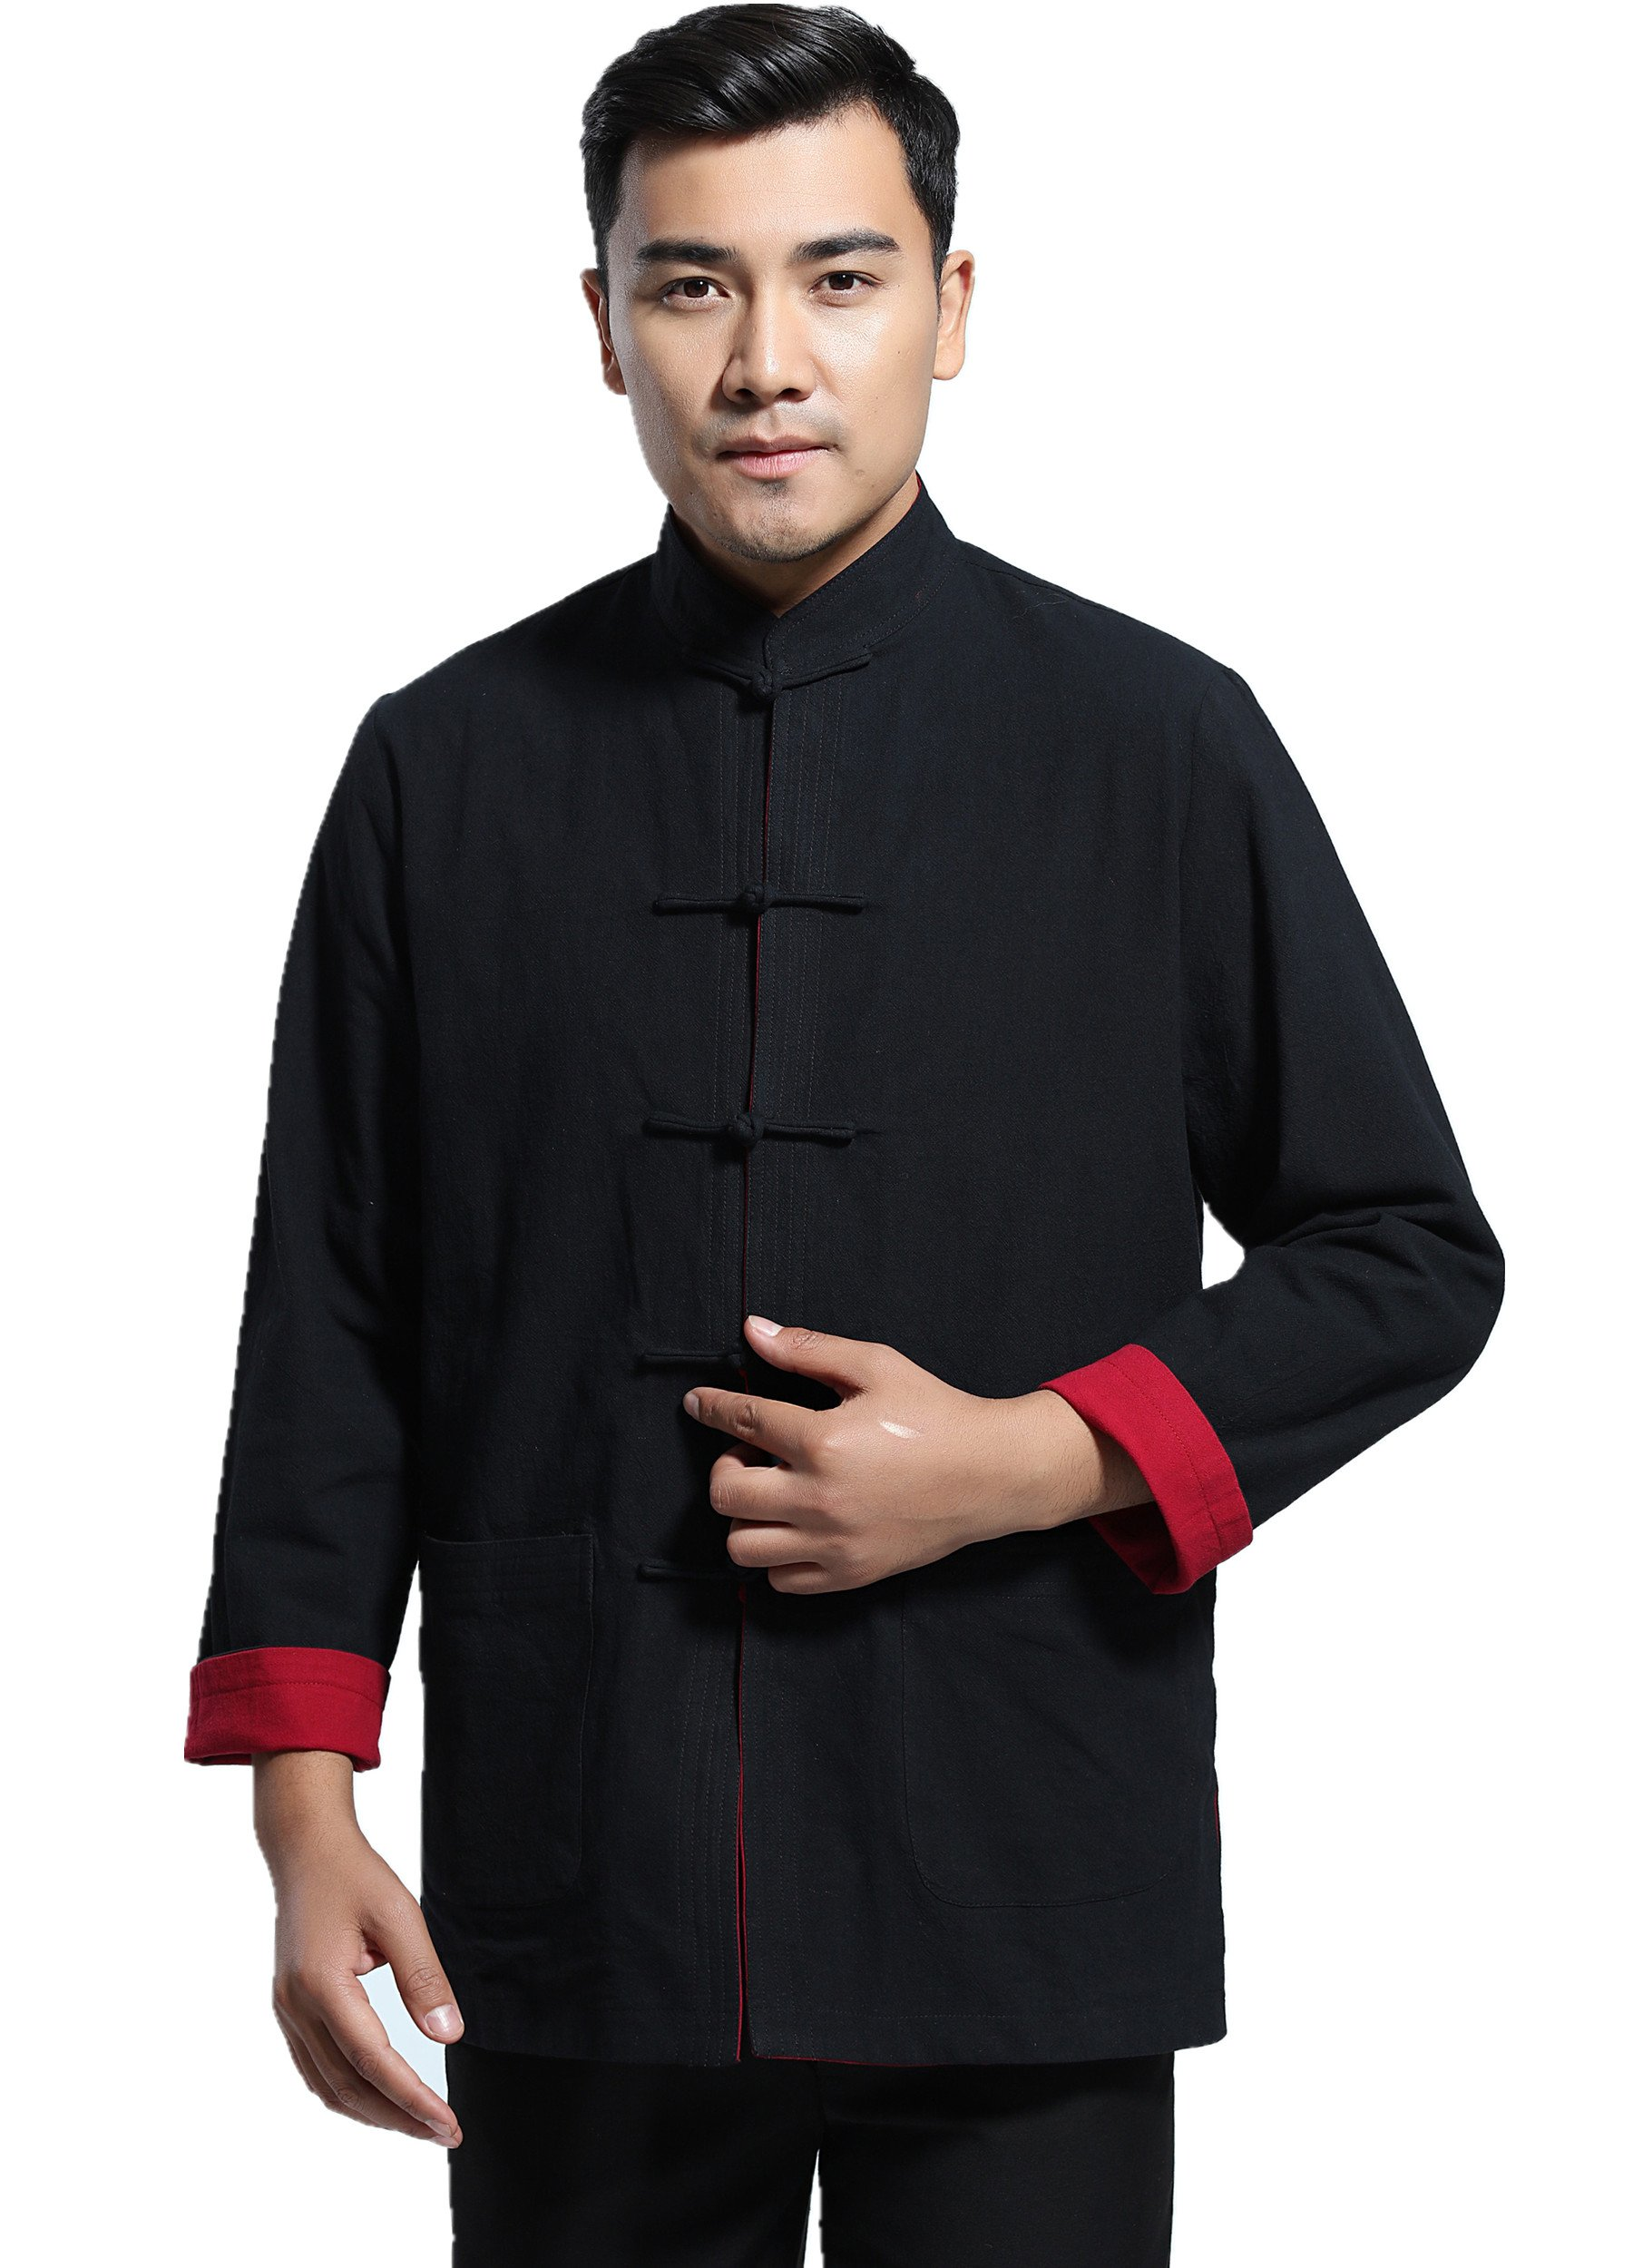 Shanghai Story Linen Men's Chinese Shirt Chinese Style Reversible Jacket M Blk